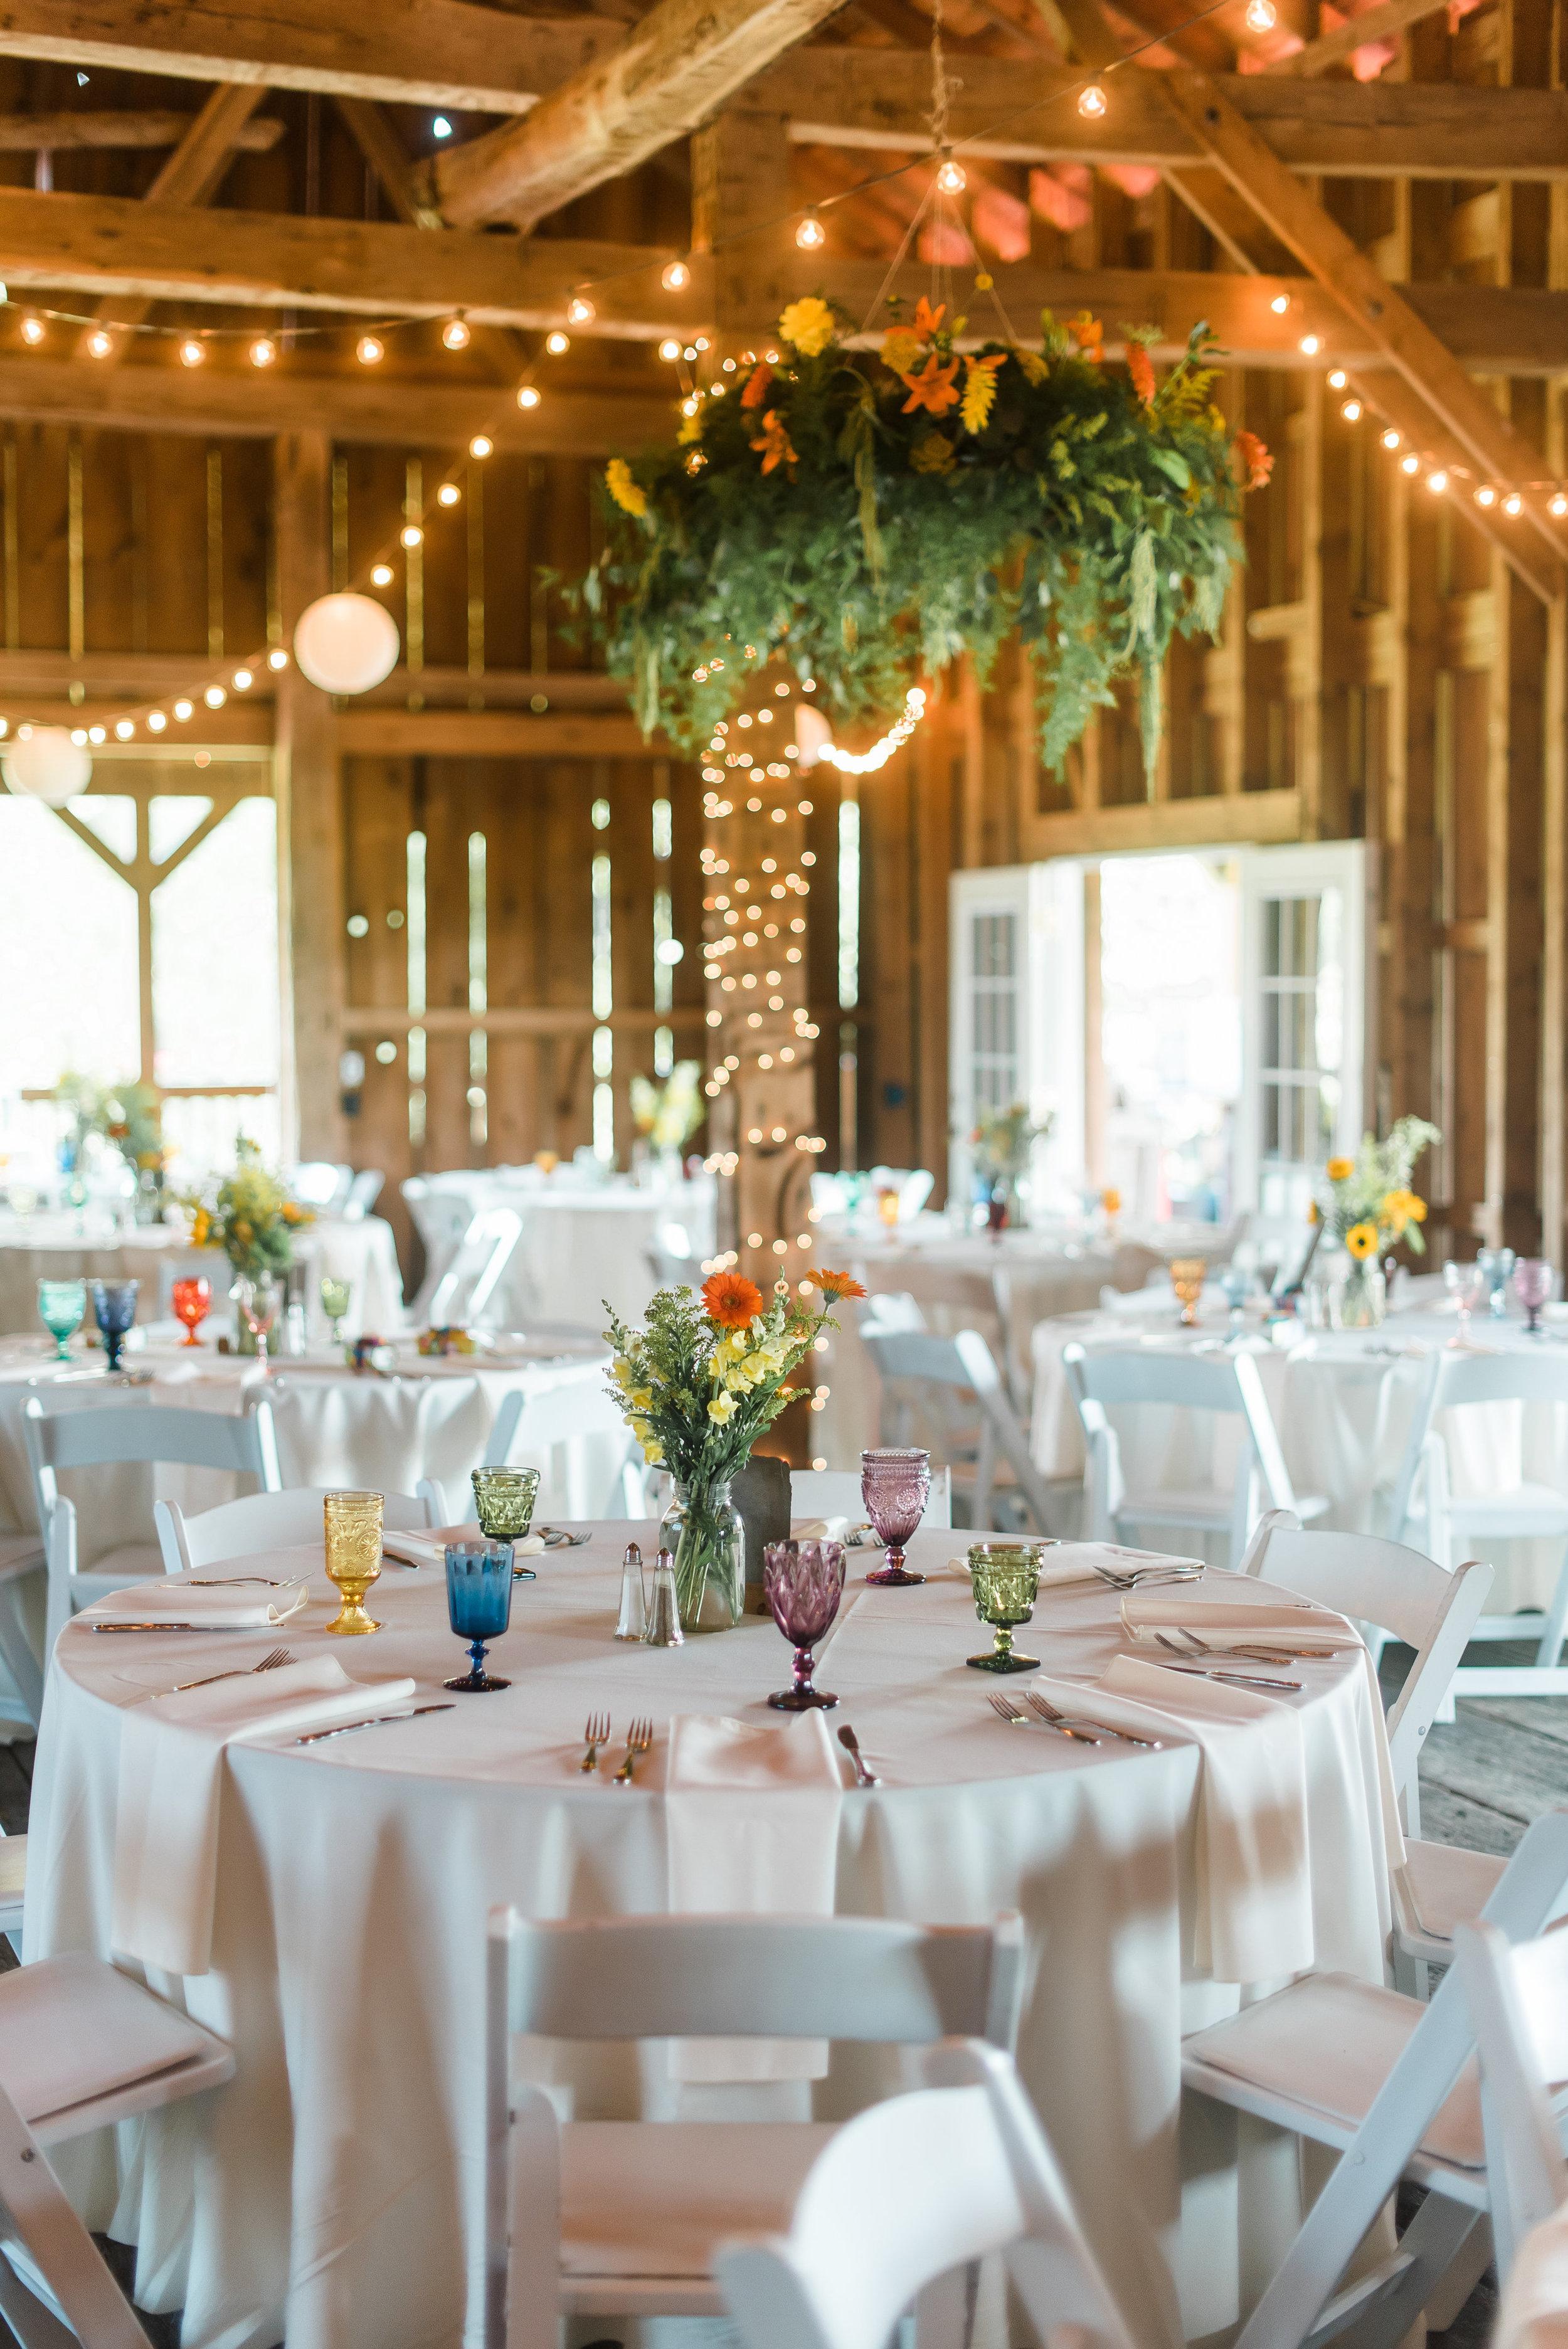 pittsburgh-wedding-photographer-armstrongfarms-eclectic-offbeat-boho0149.jpg